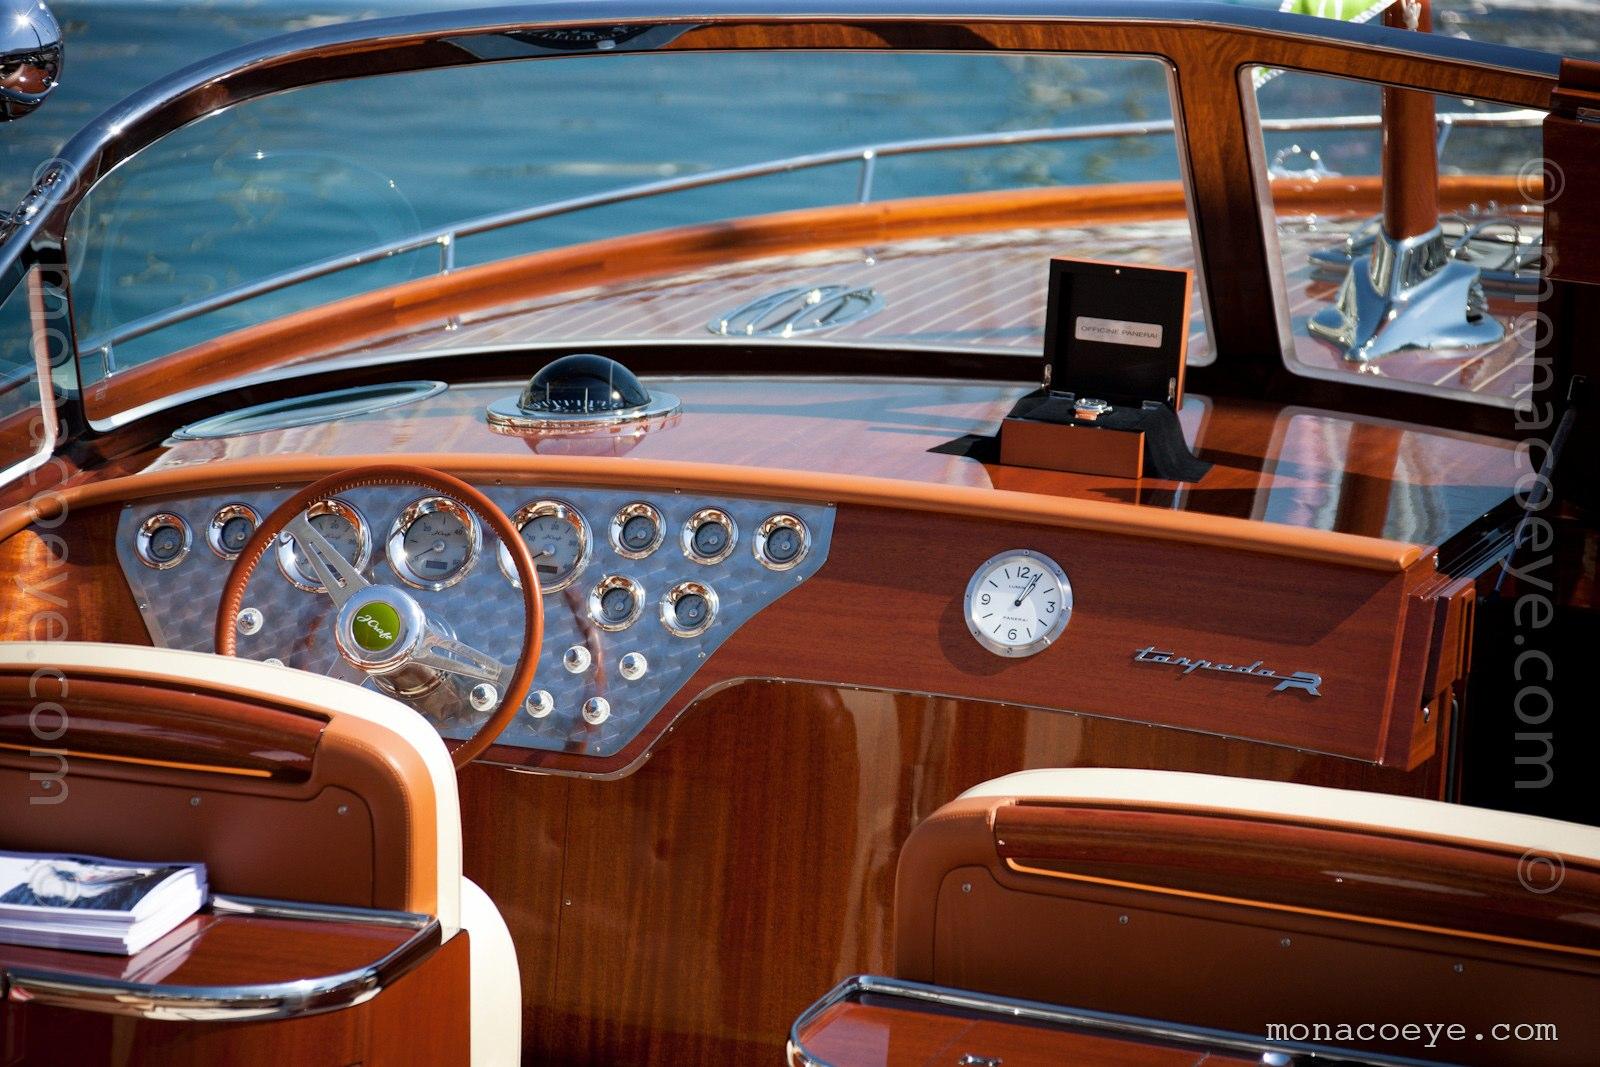 Monaco Yacht Show 2010 - J Craft Torpedo R dashboard